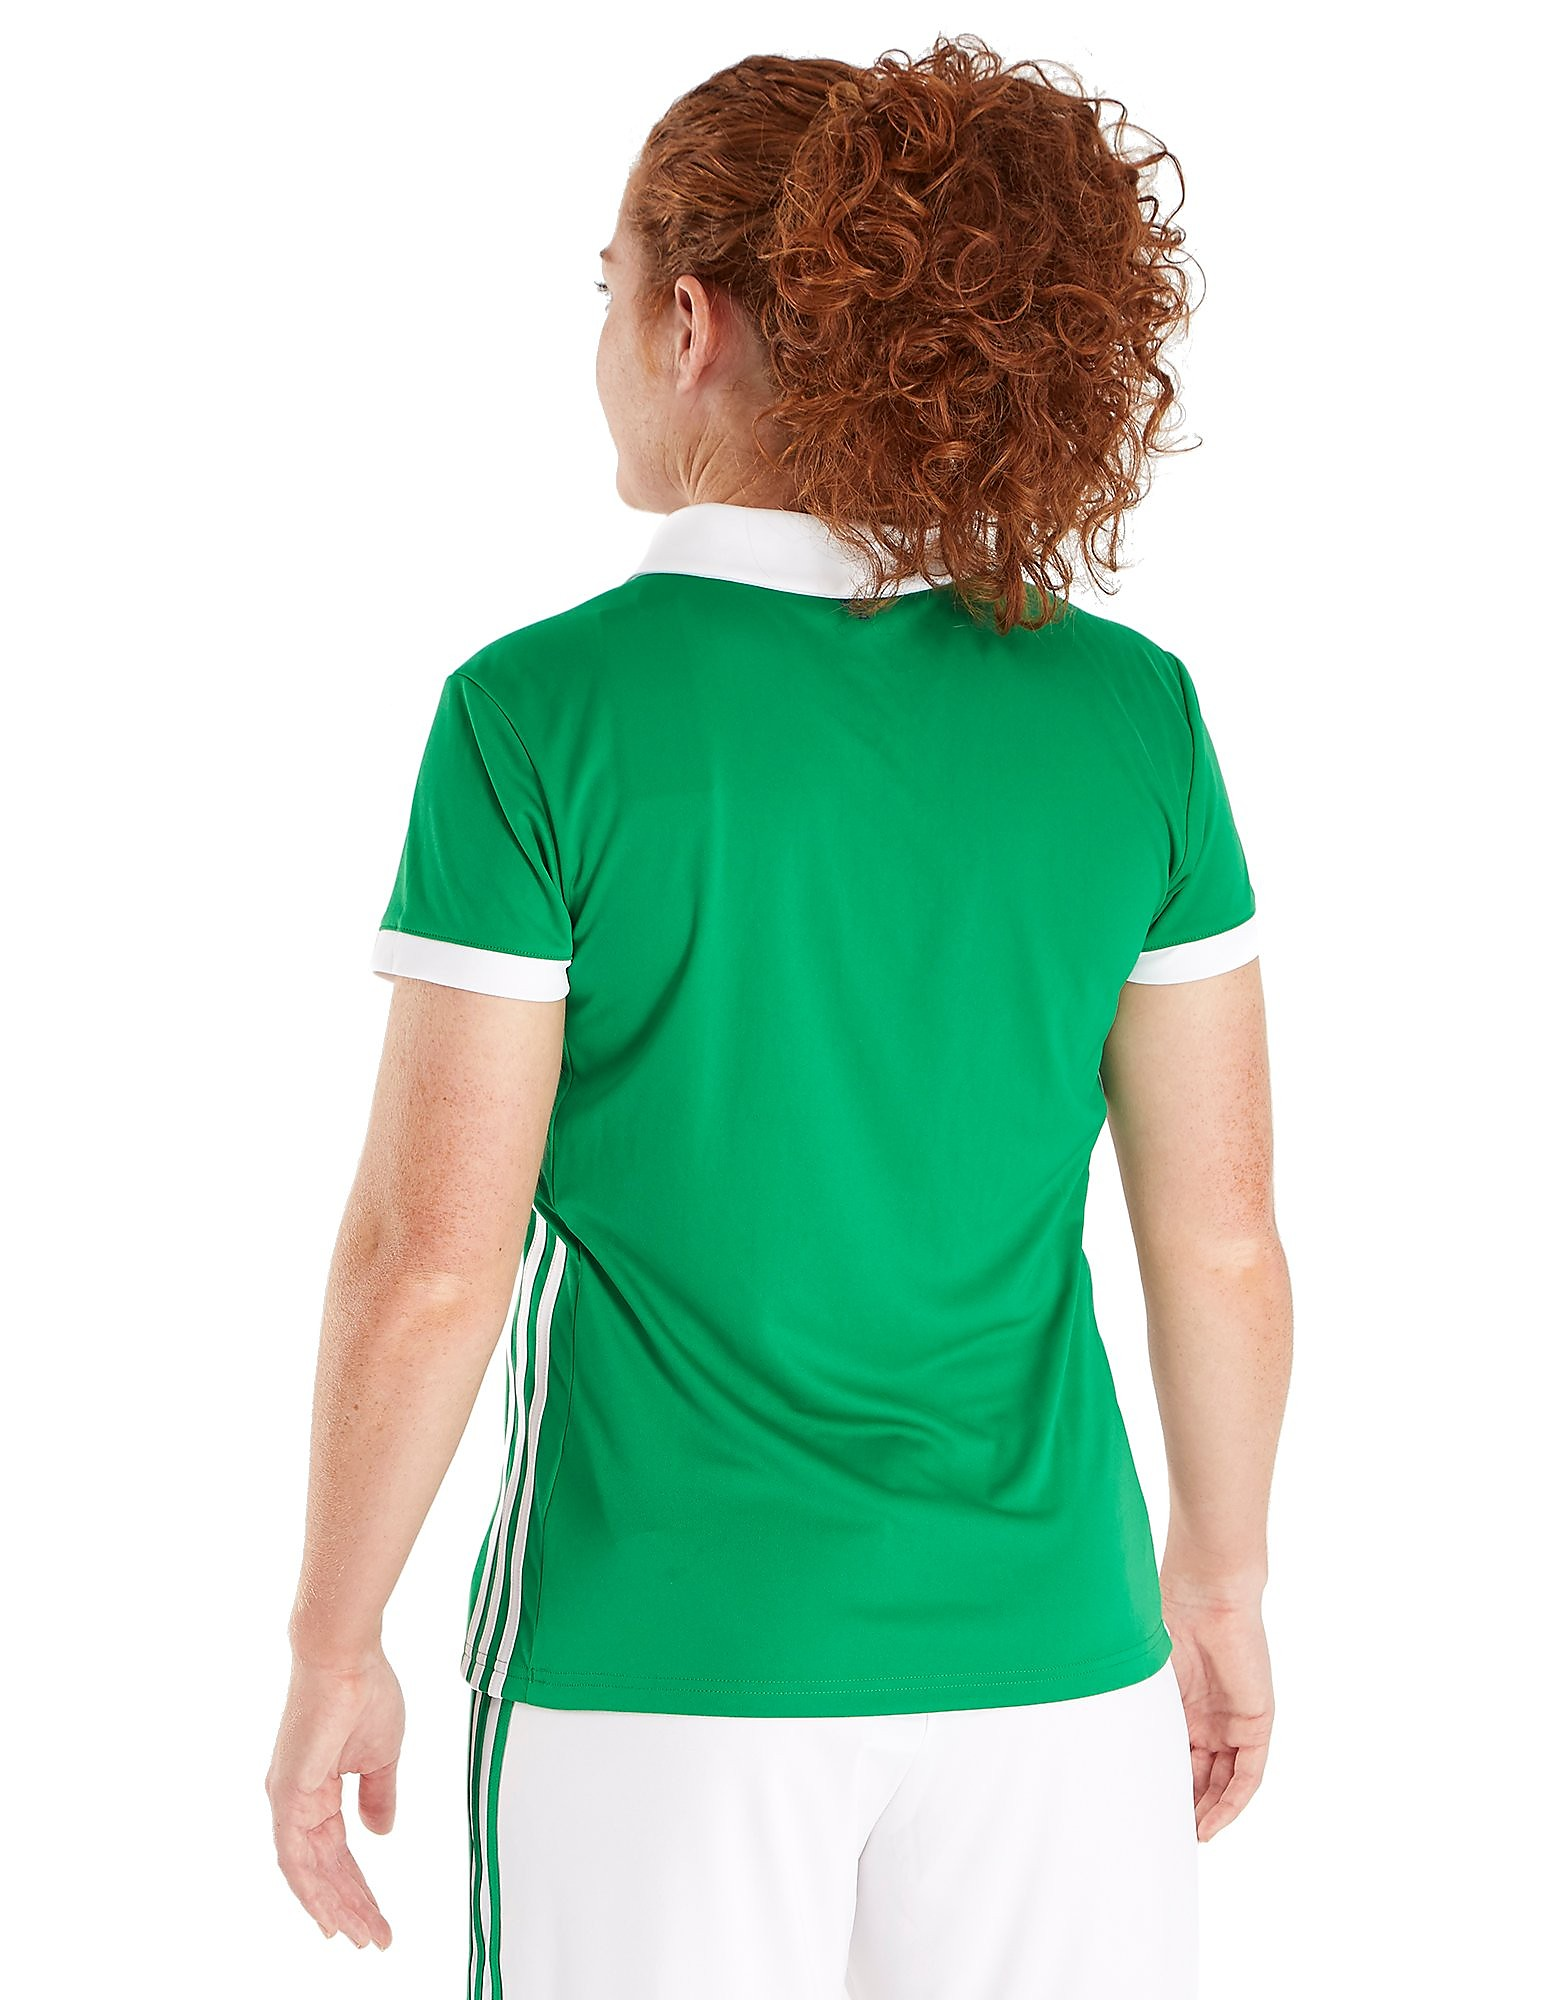 adidas Northern Ireland 2017/18 Home Shirt Womens PRE ORD